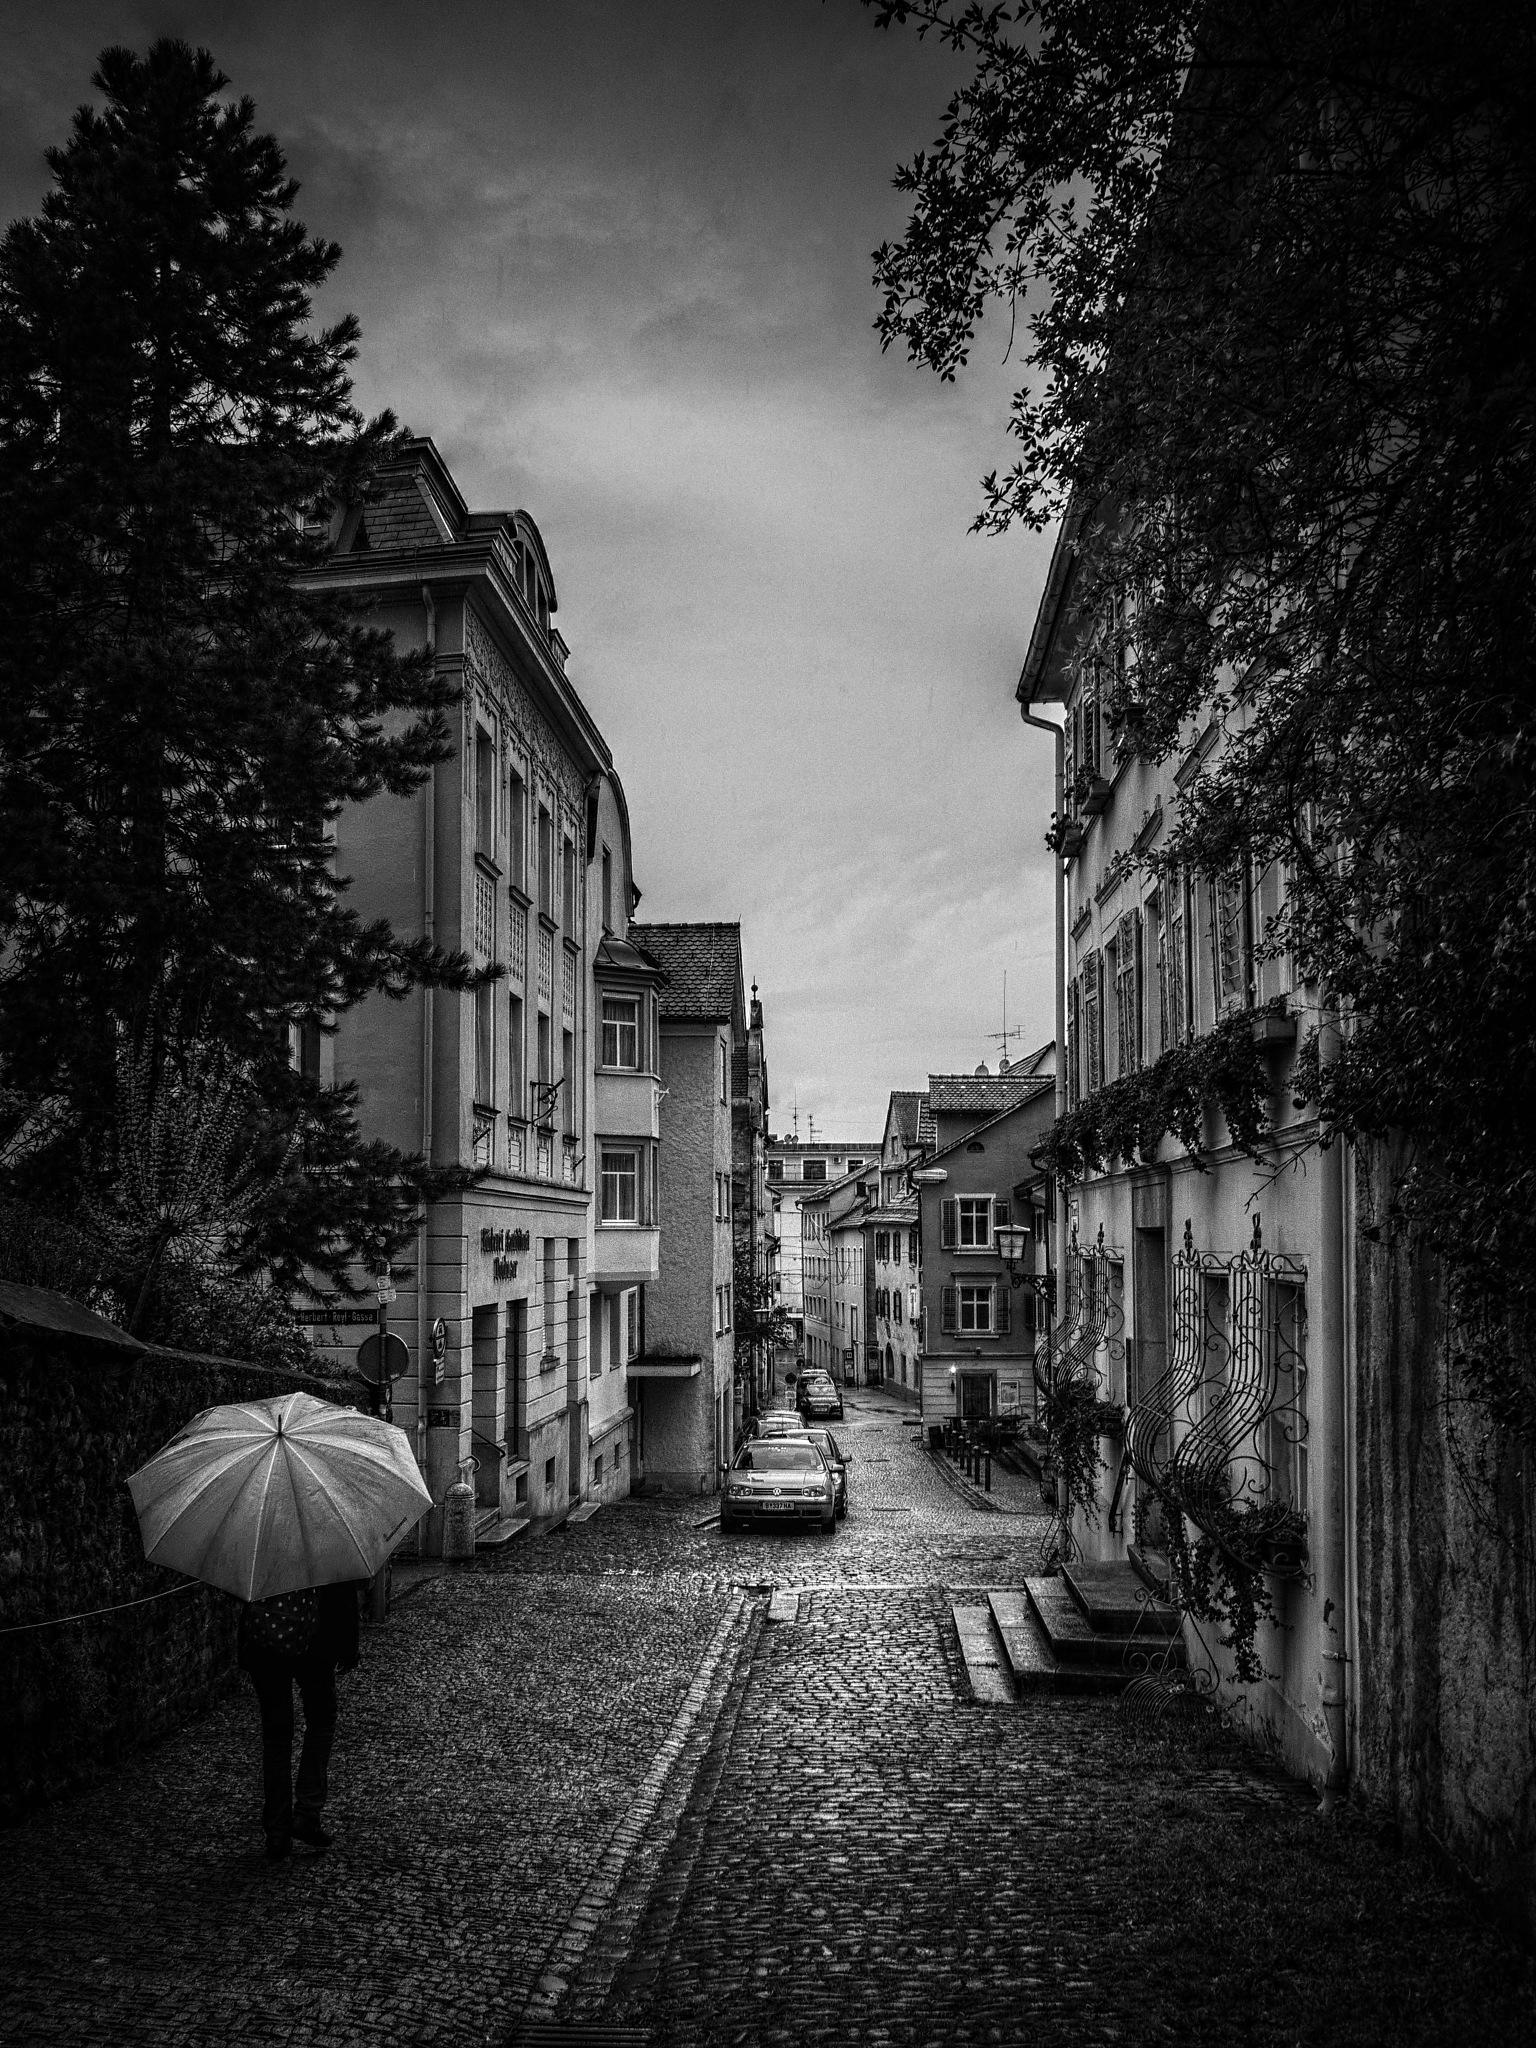 in restless dreams I walk alone by koaxial